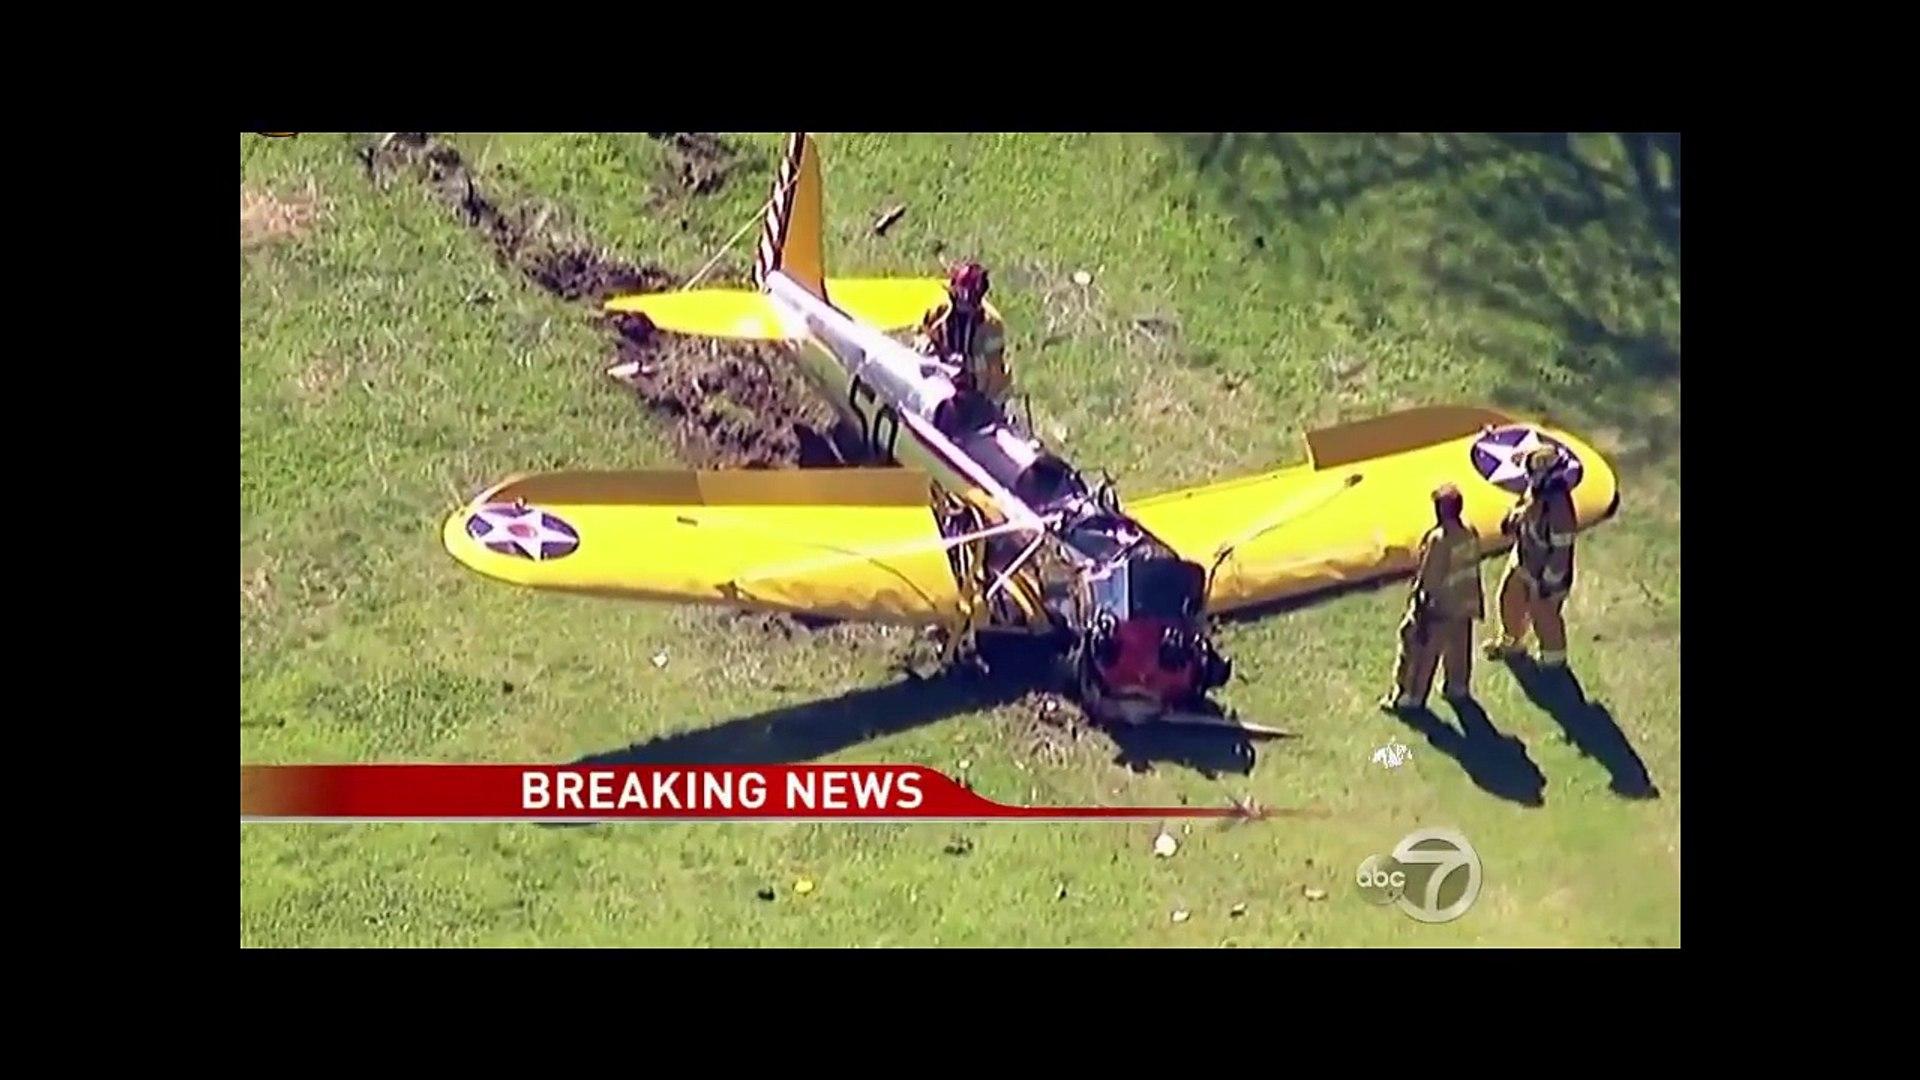 Harrison Ford Plane Crash Into L.A. Golf Course. Harrison Ford Critical Condition